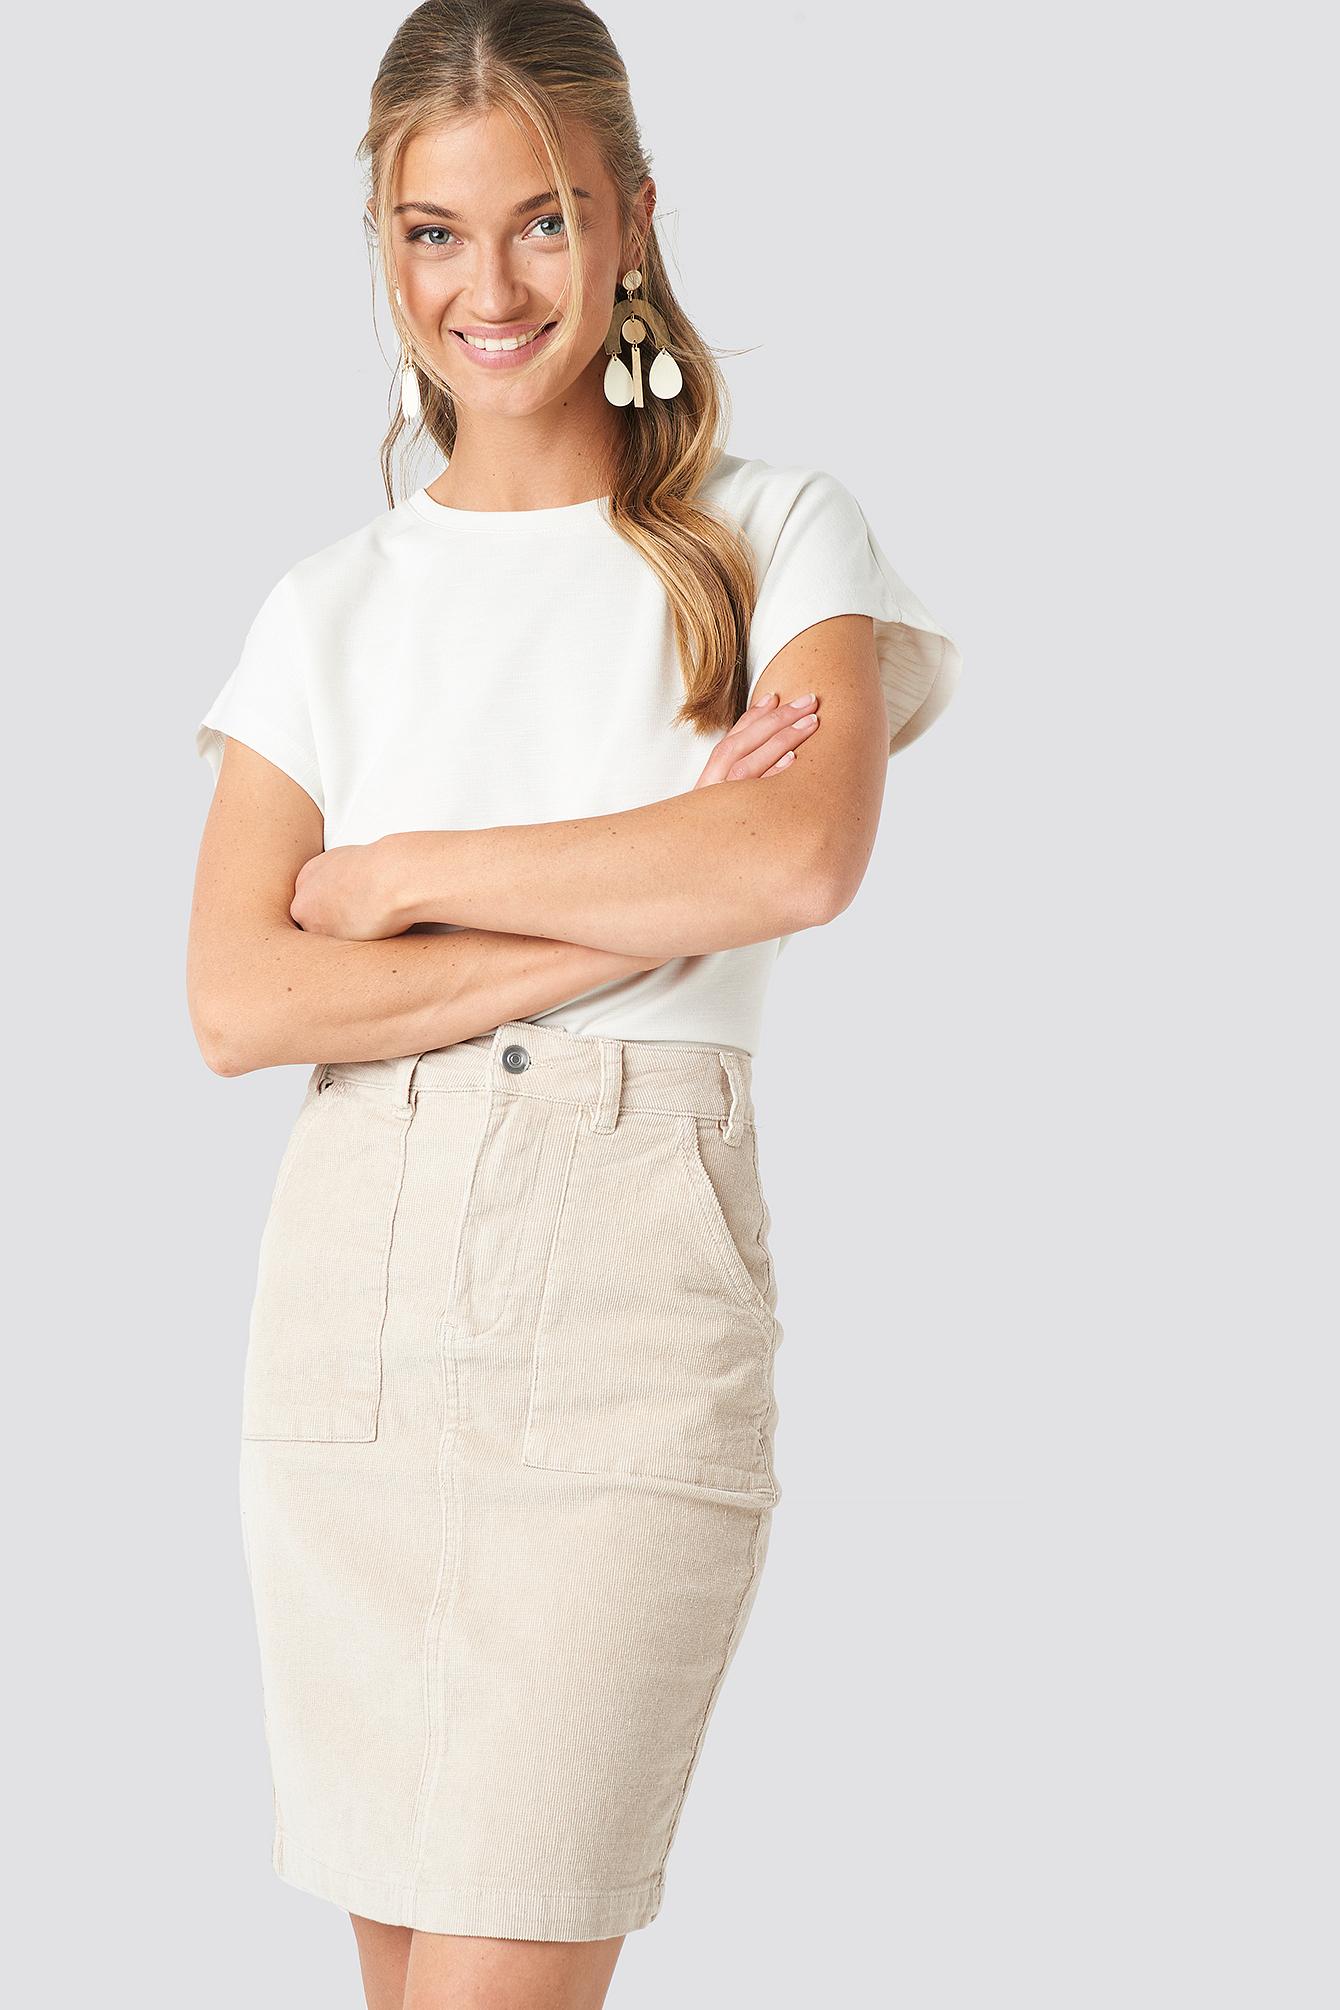 Bounta Skirt NA-KD.COM